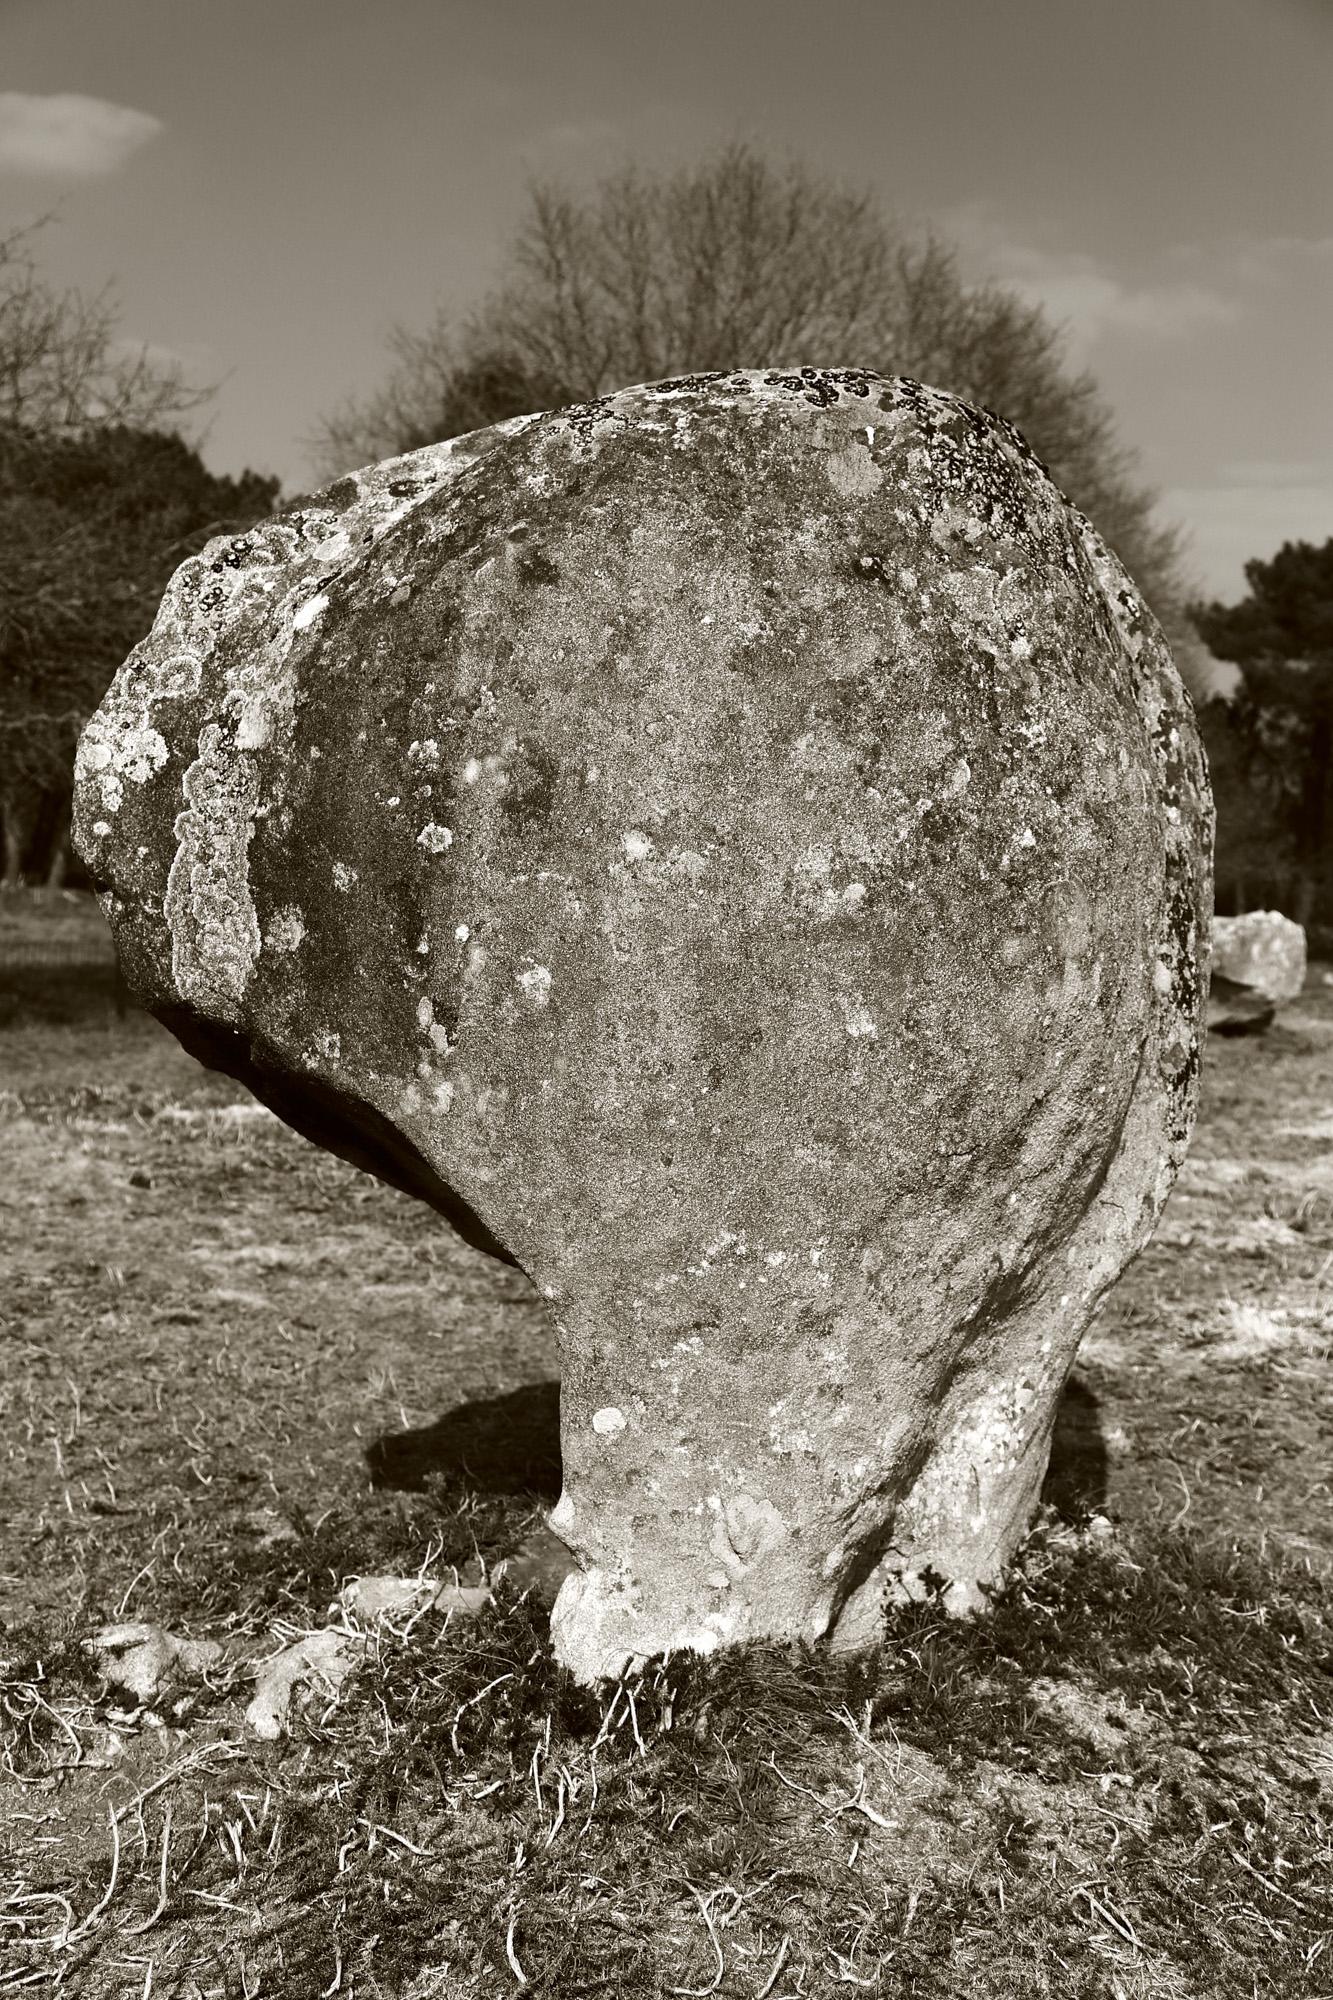 20160323_france_bretagne_carnac_stones-102.jpg